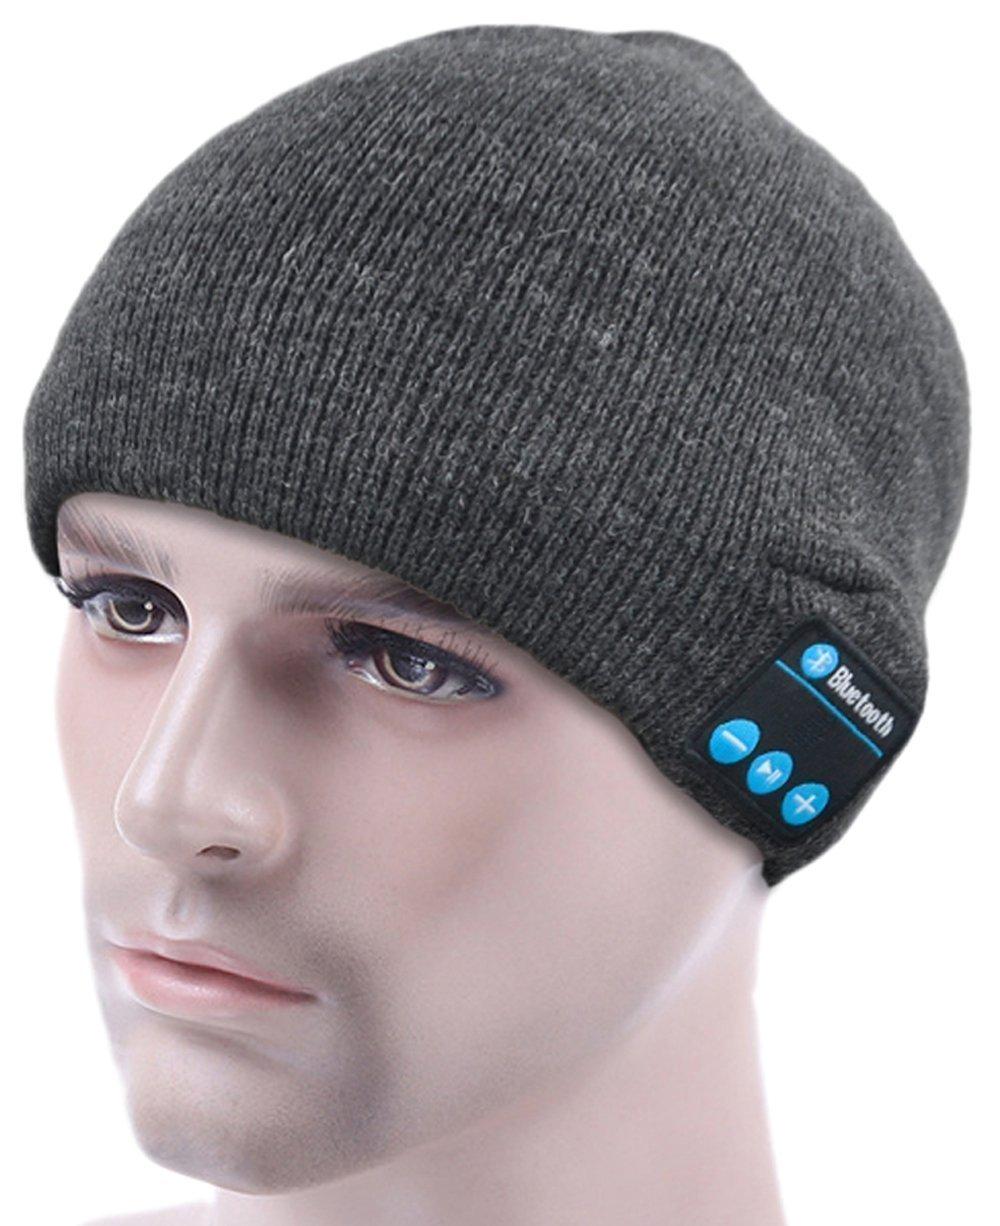 8dfa491cf16 ULTRICS® Bluetooth Beanie Hat - Warm Unisex Winter Knit  Amazon.co.uk   Electronics